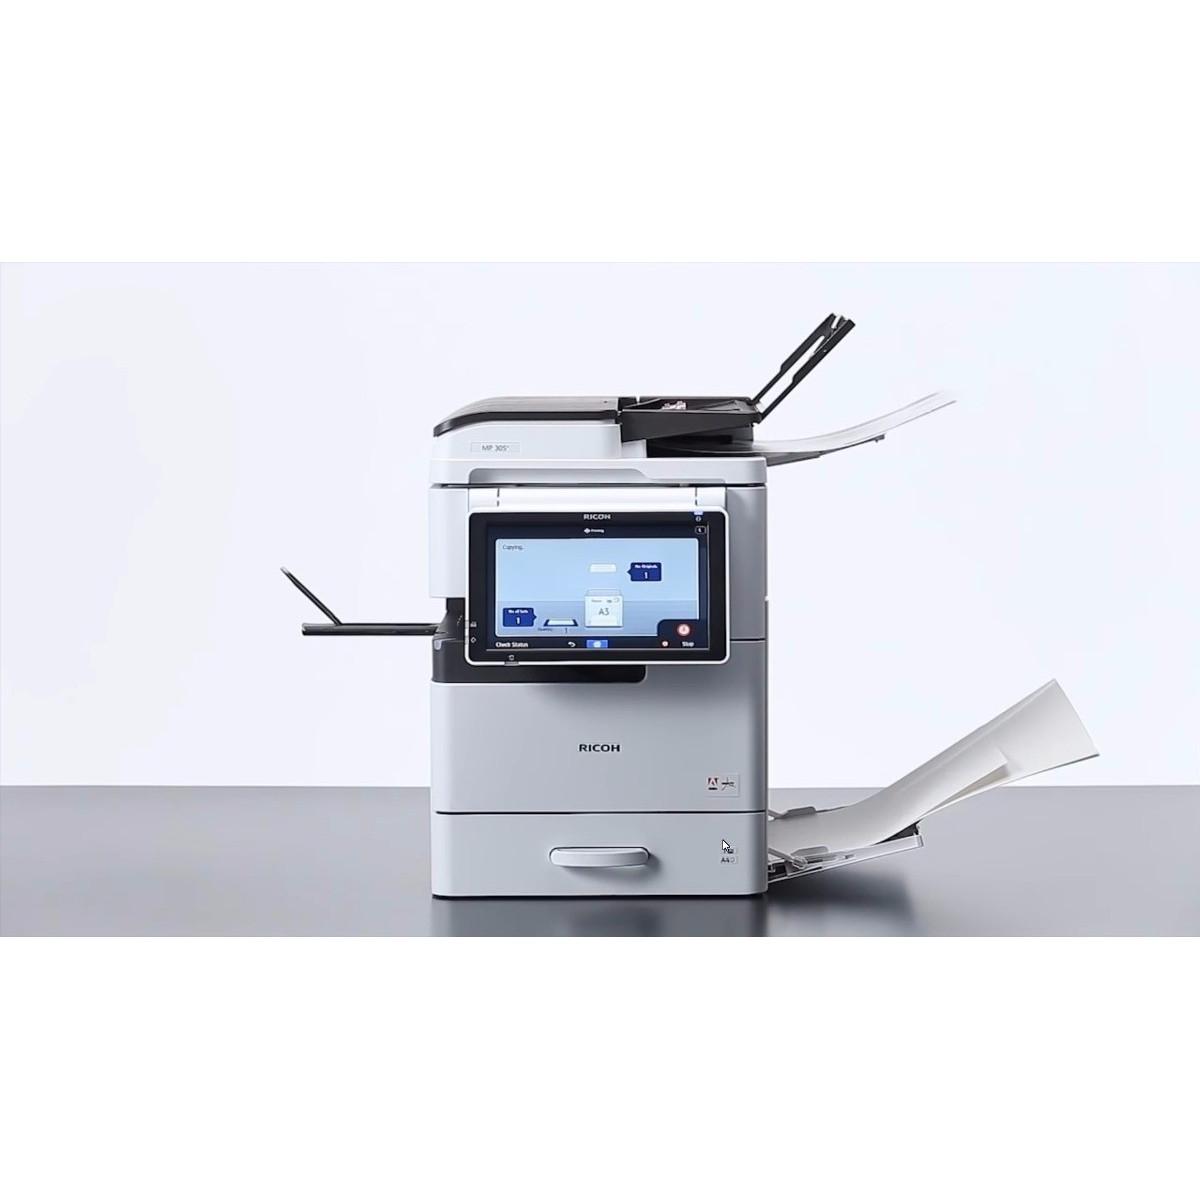 Impresora Fotocopiadora Ricoh Mp 305spf Mym Systech